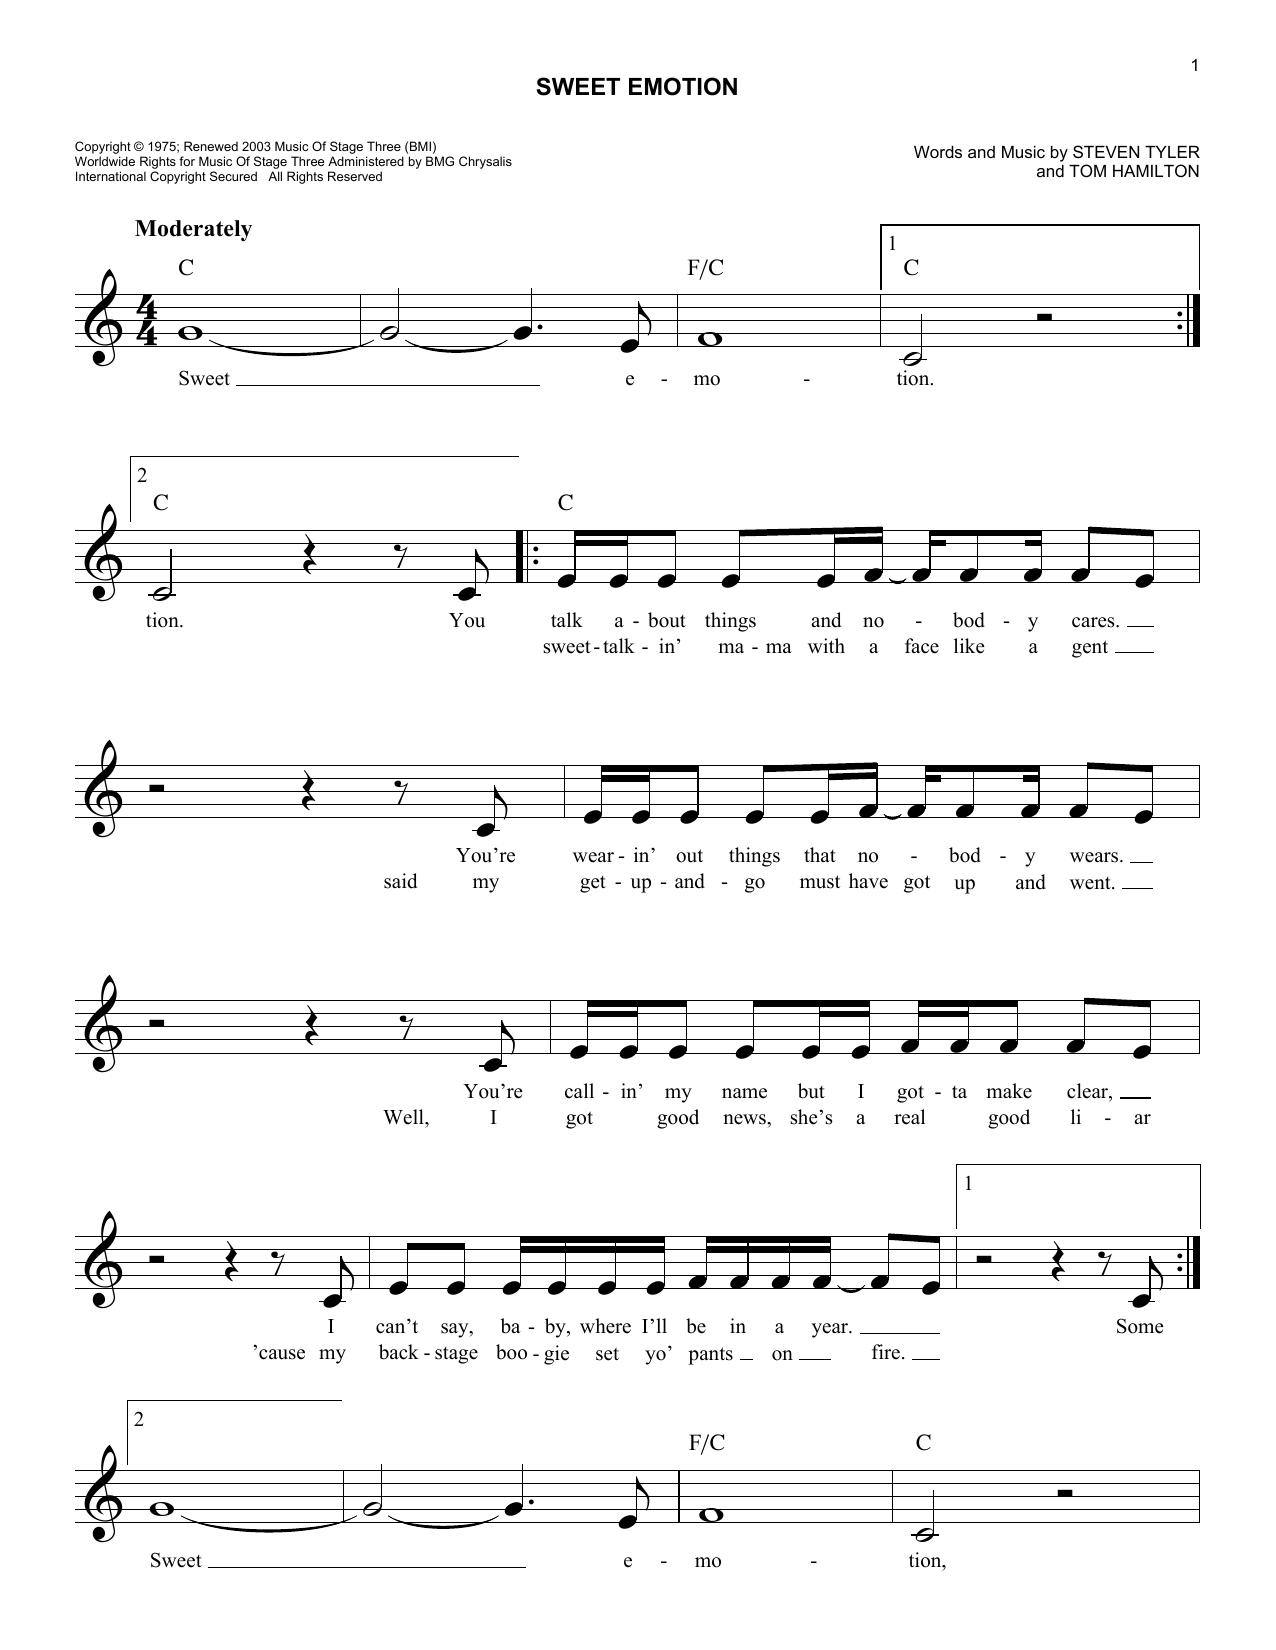 Sheet Music Digital Files To Print Licensed Tom Hamilton Digital